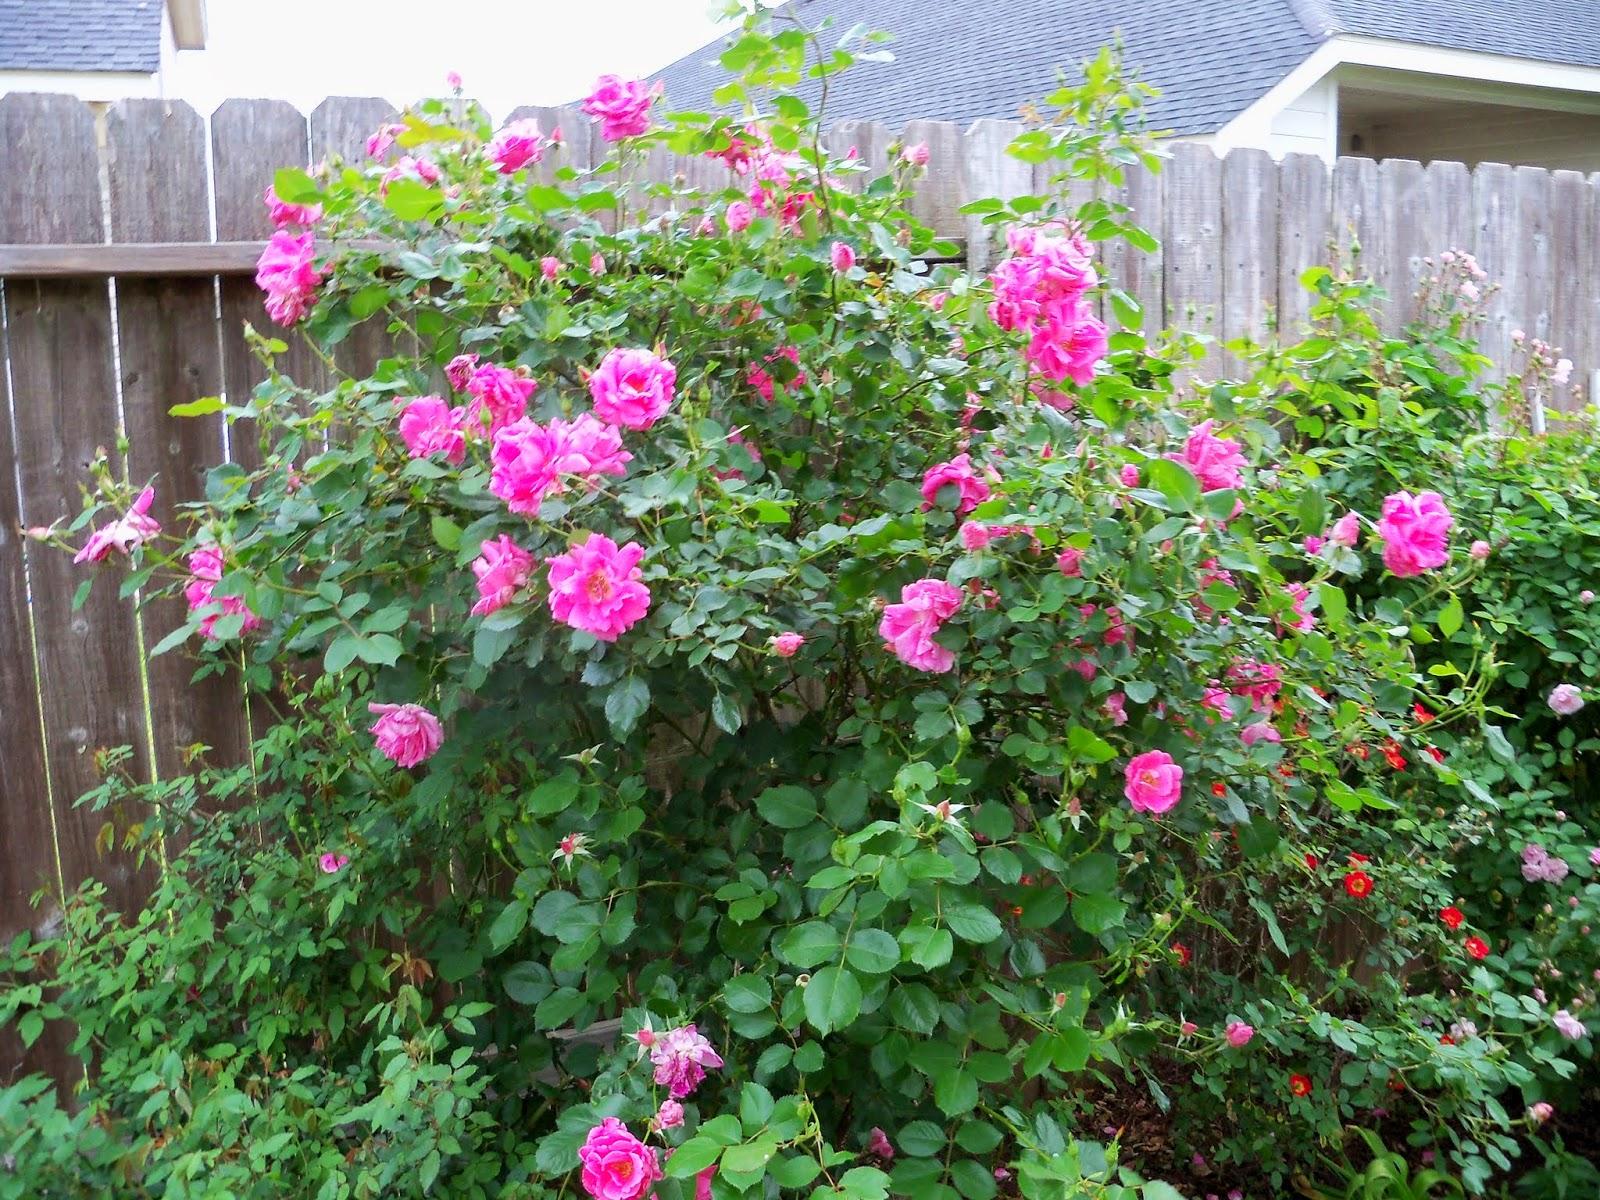 Gardening 2014 - 116_1493.JPG